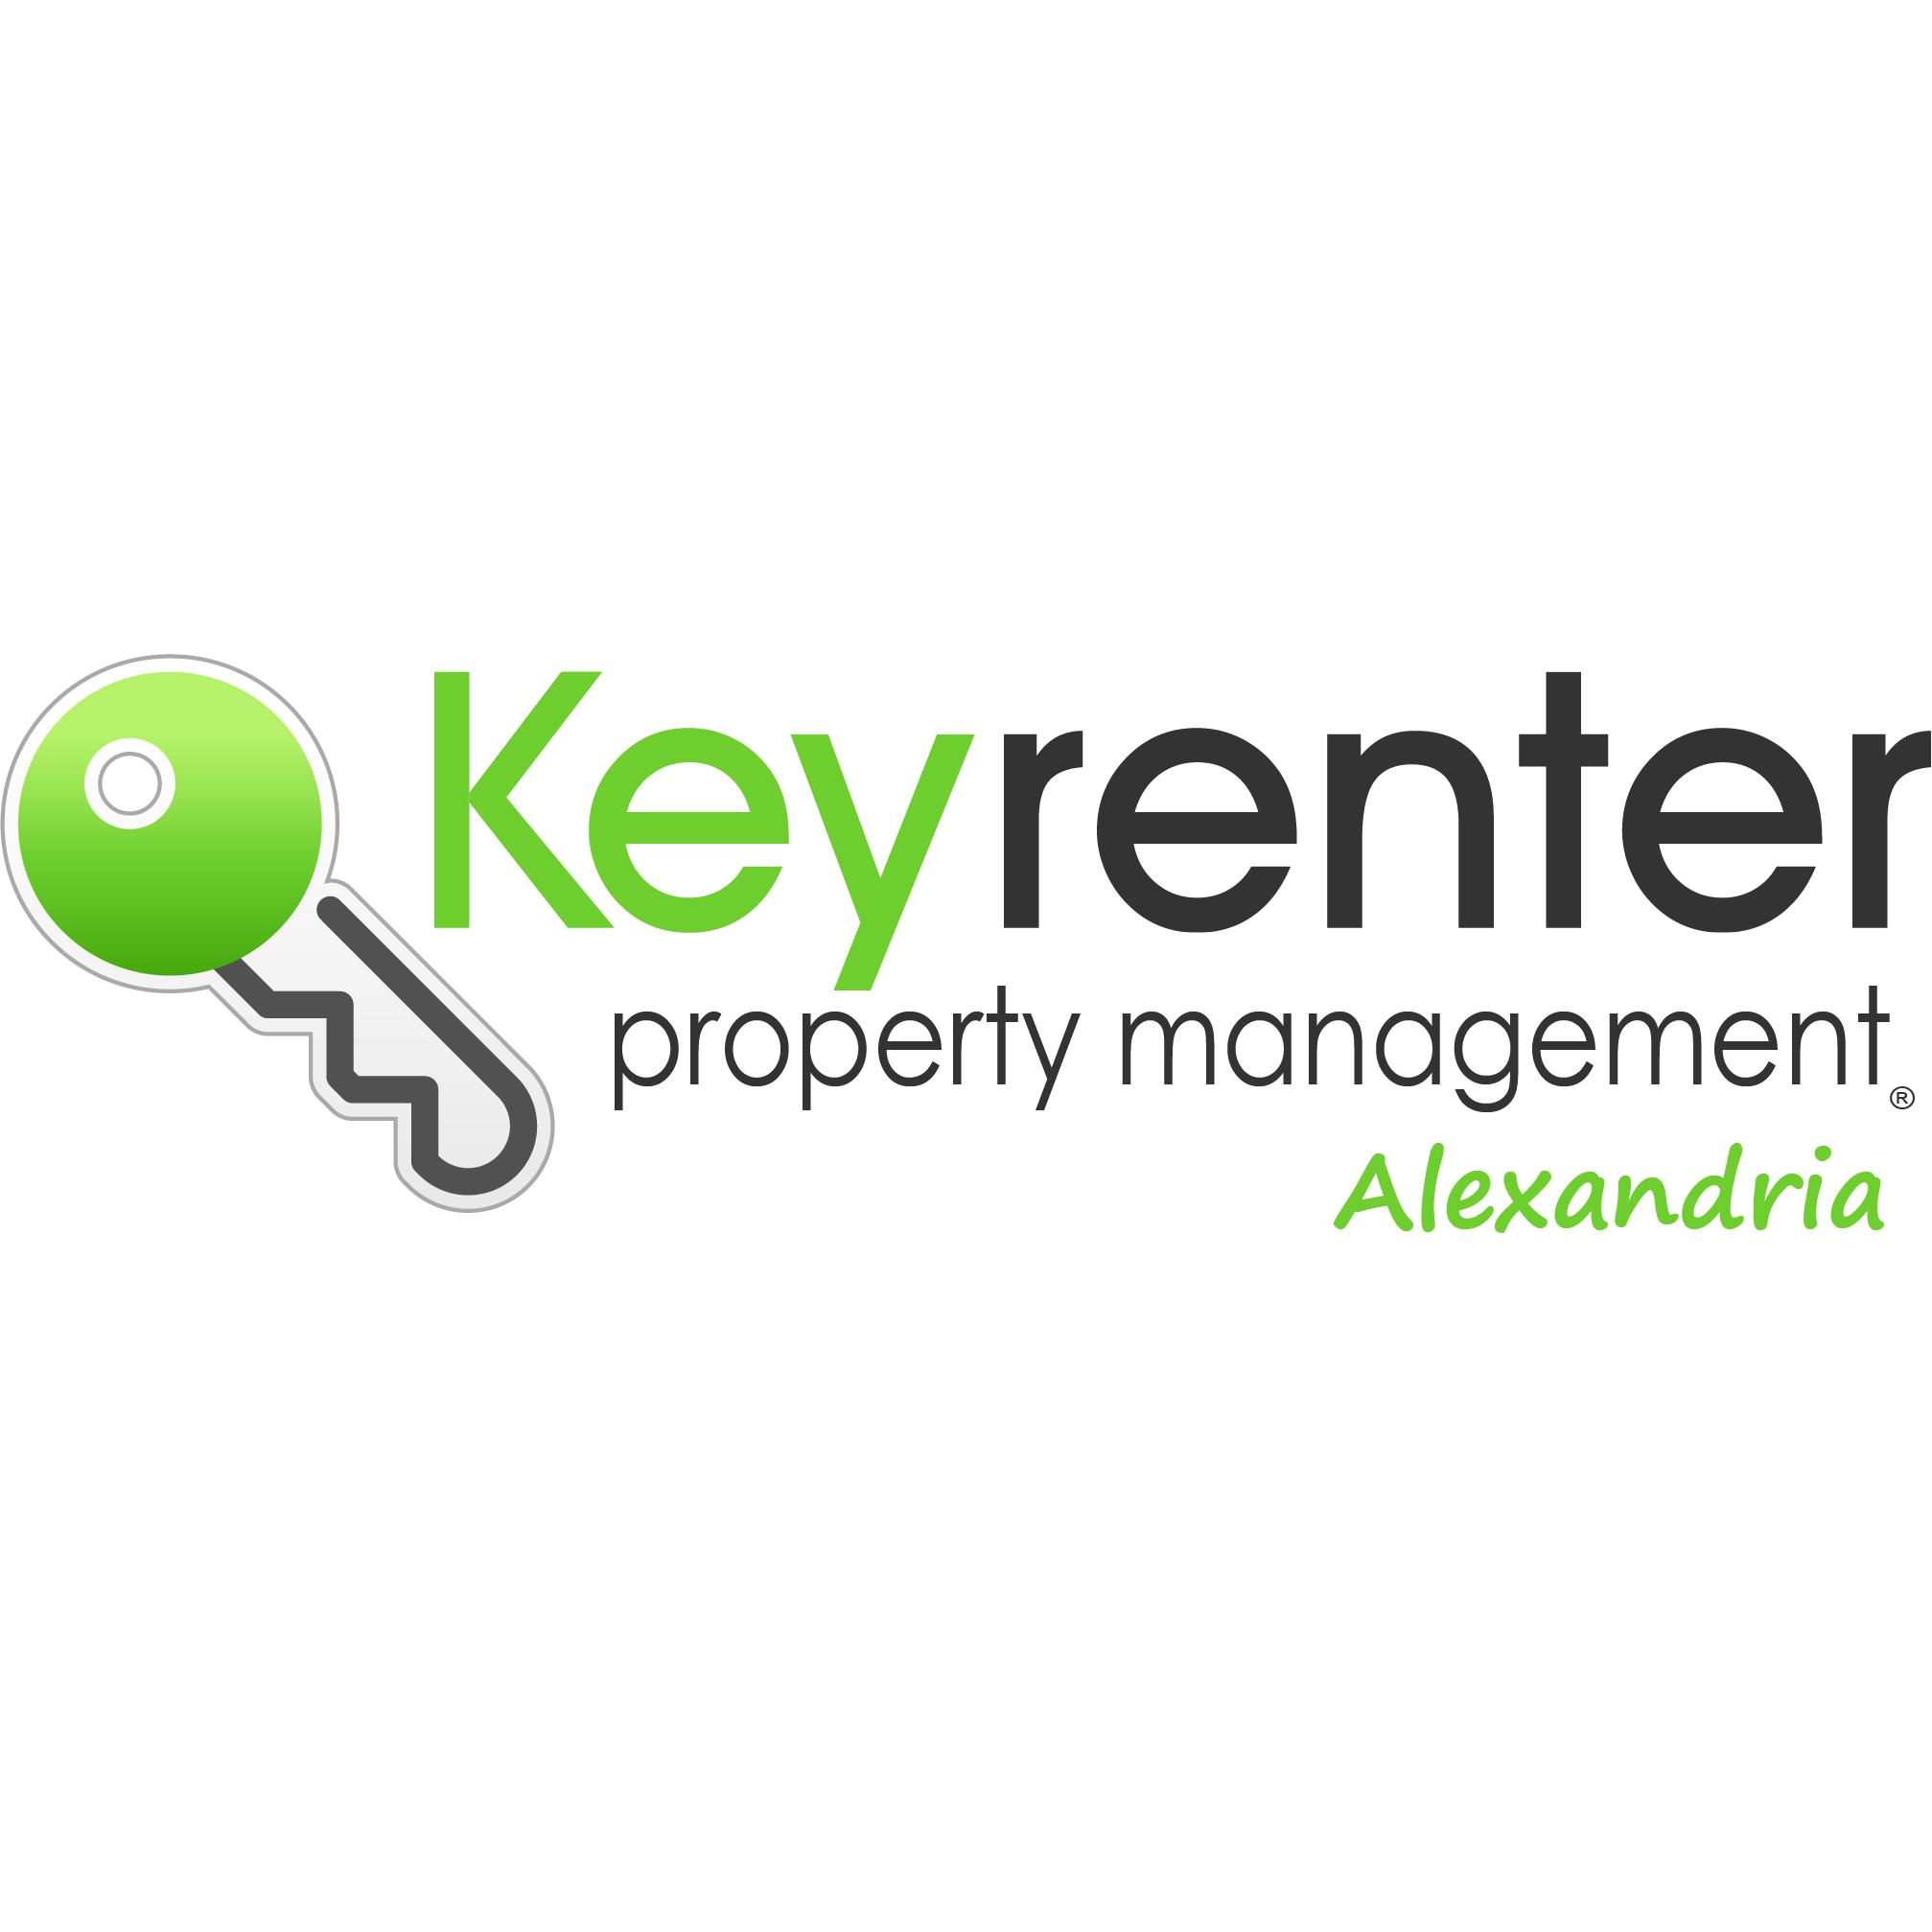 Keyrenter Property Management Alexandria